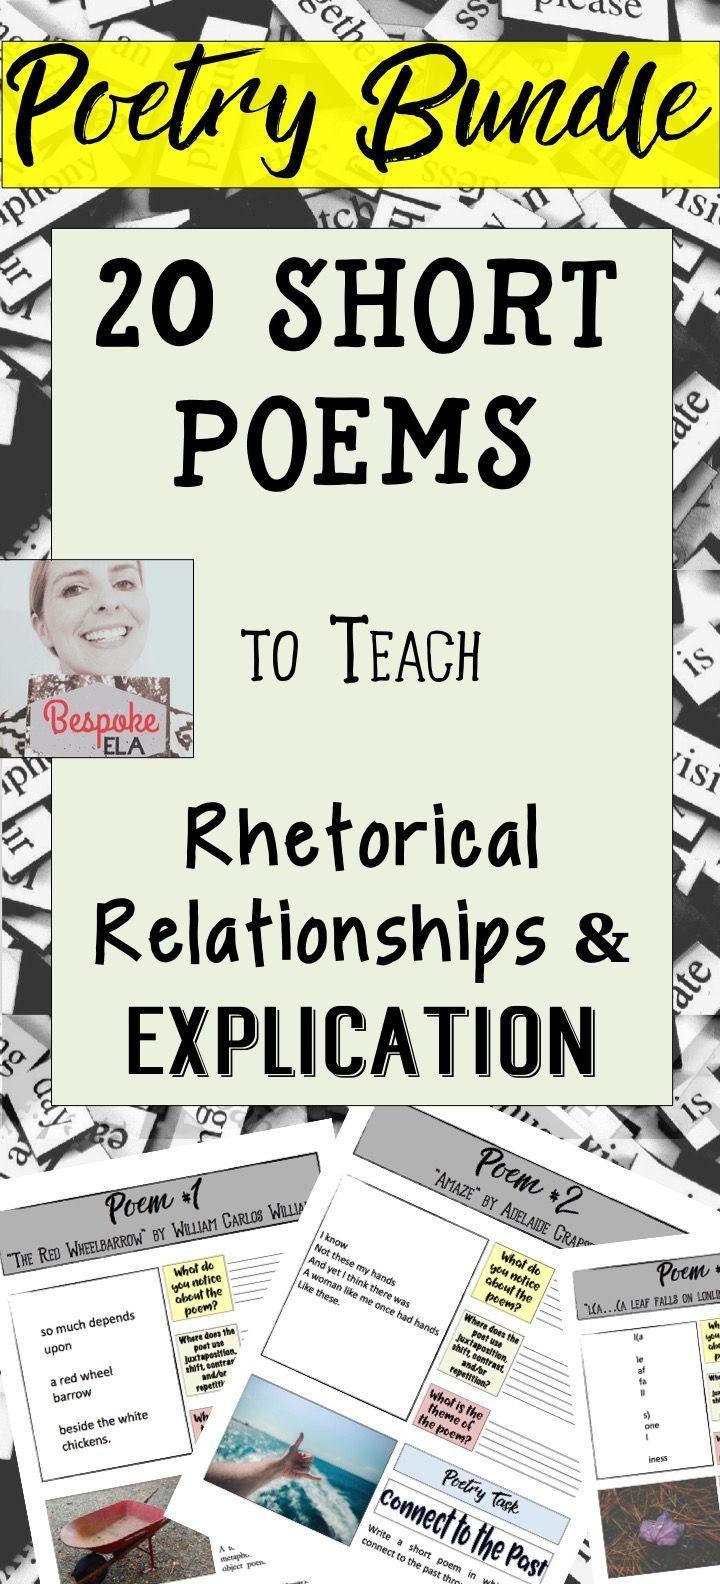 'Relationships' Poetry (Edexcel)